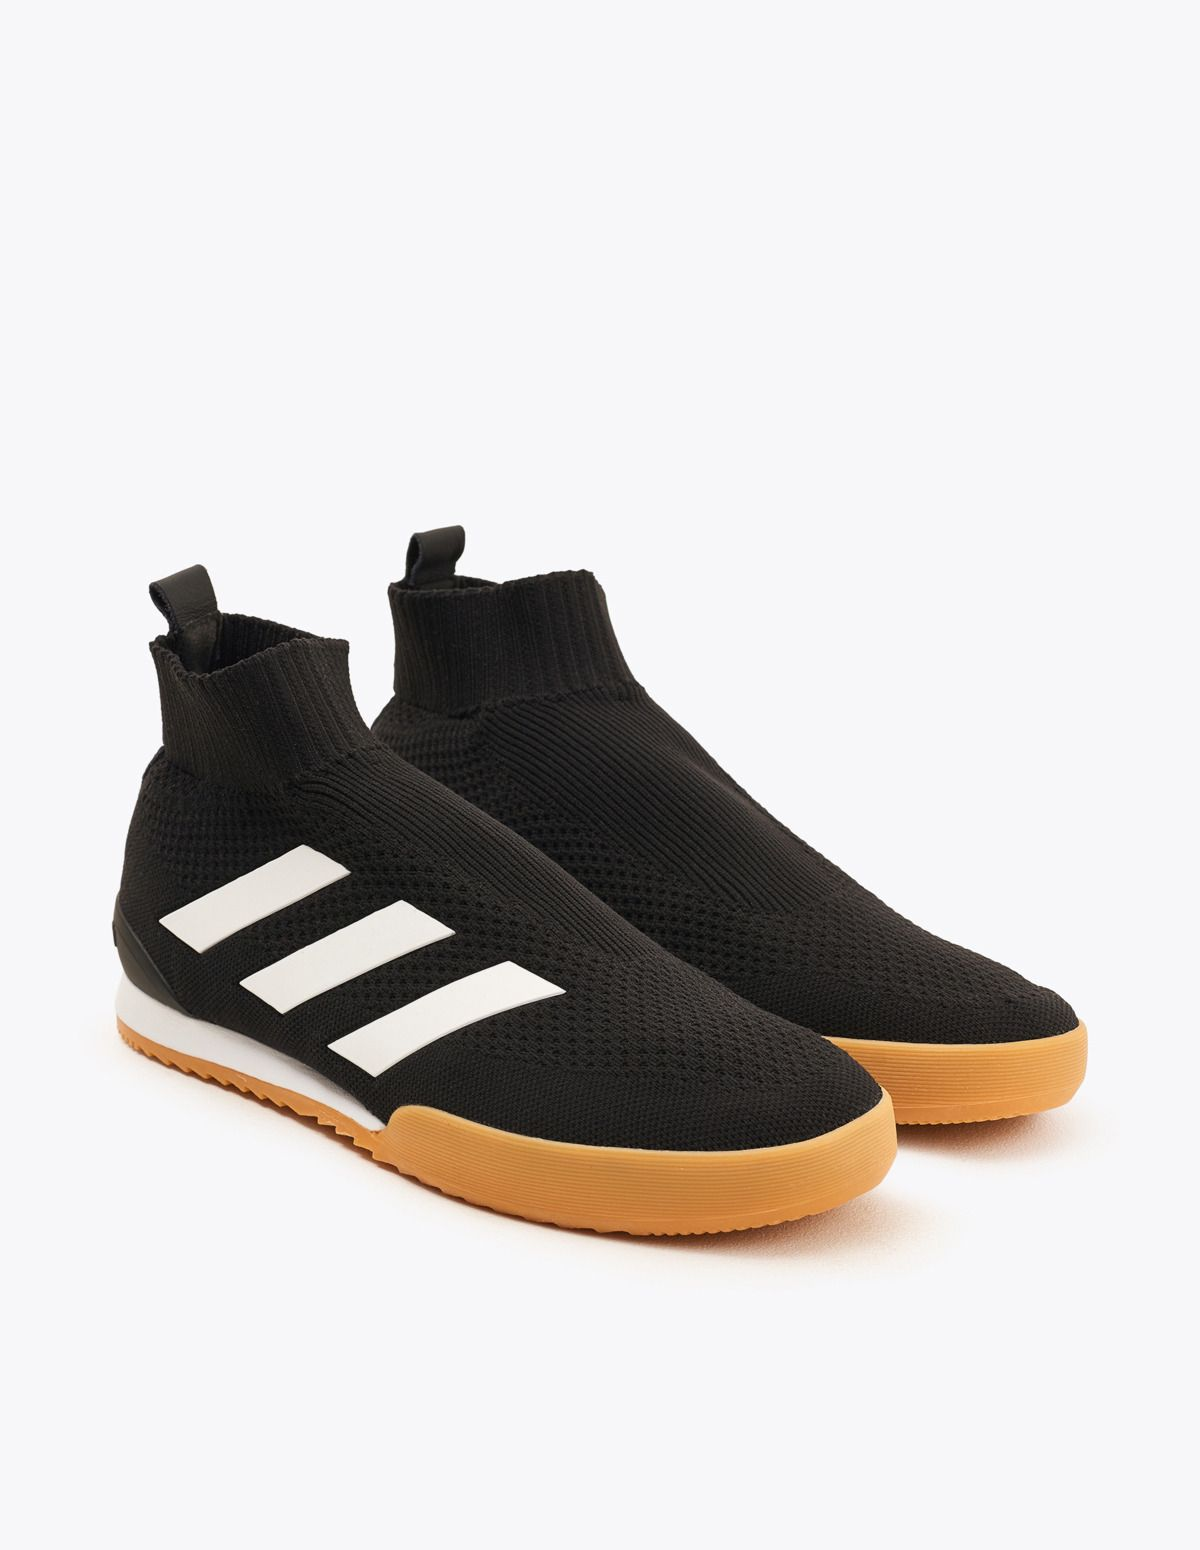 adidas designer shoes- OFF 58% - www